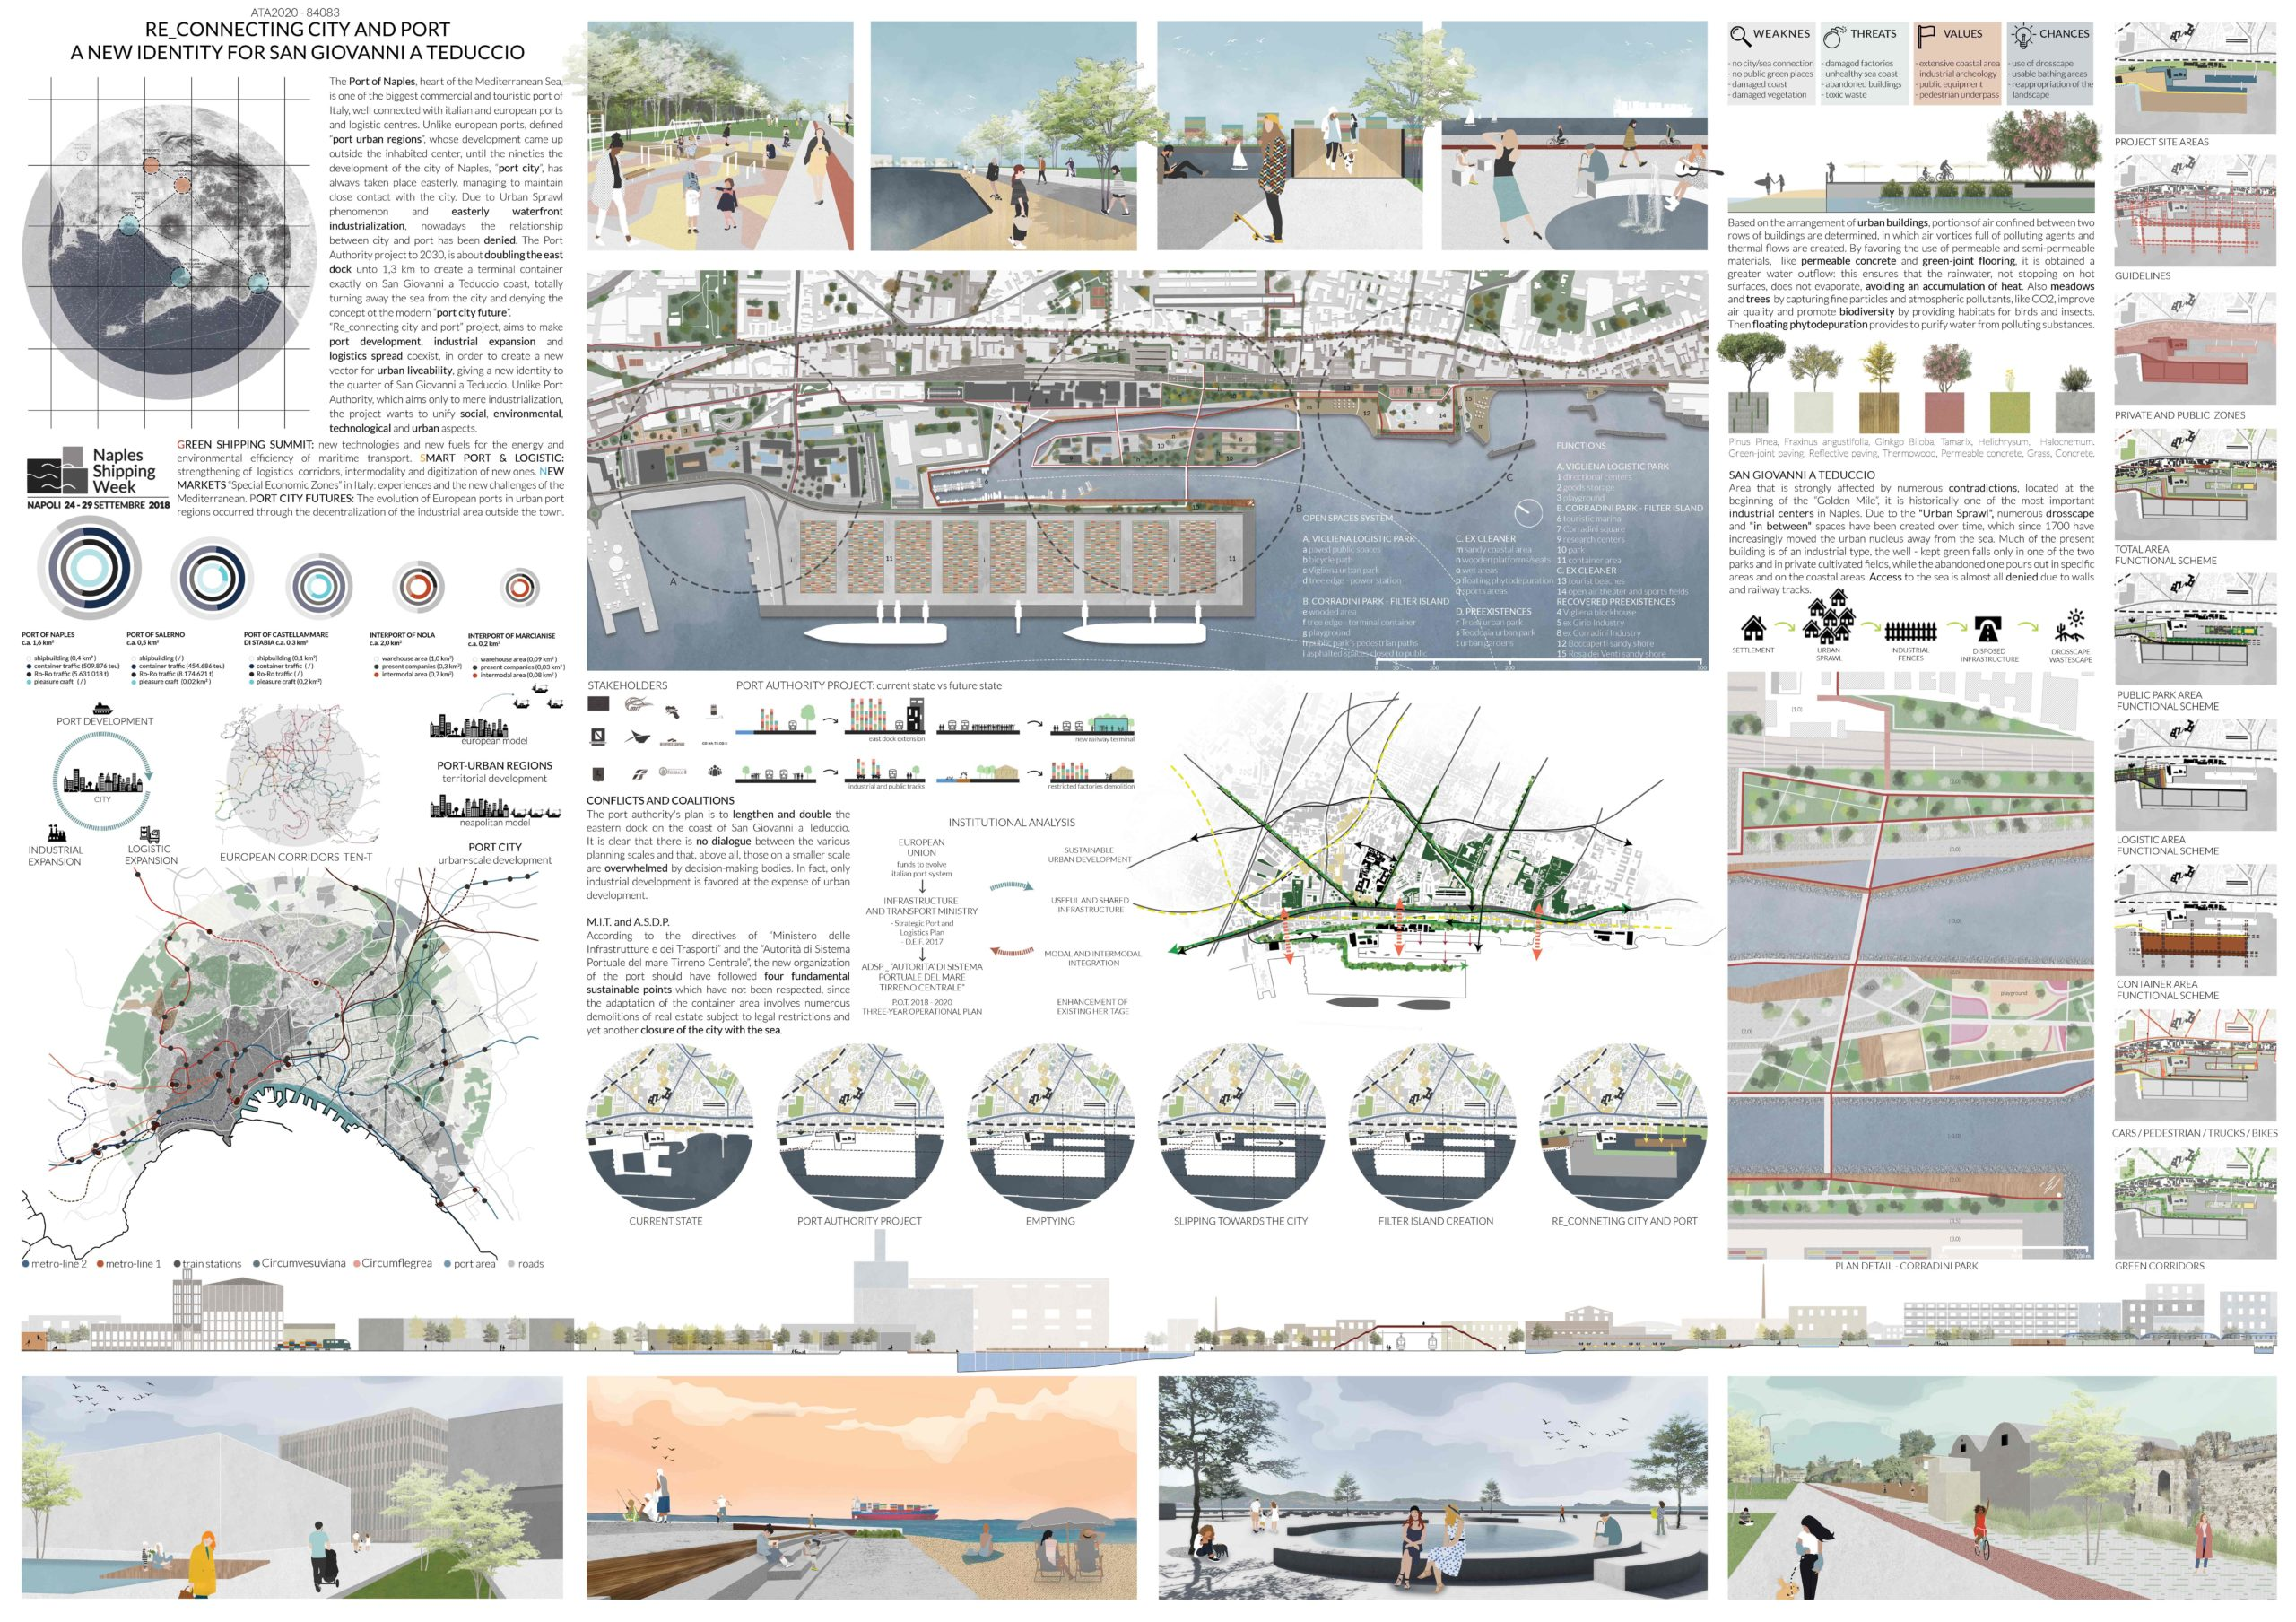 re_connecting city and port: a new identity for San Giovanni a Teduccio Board